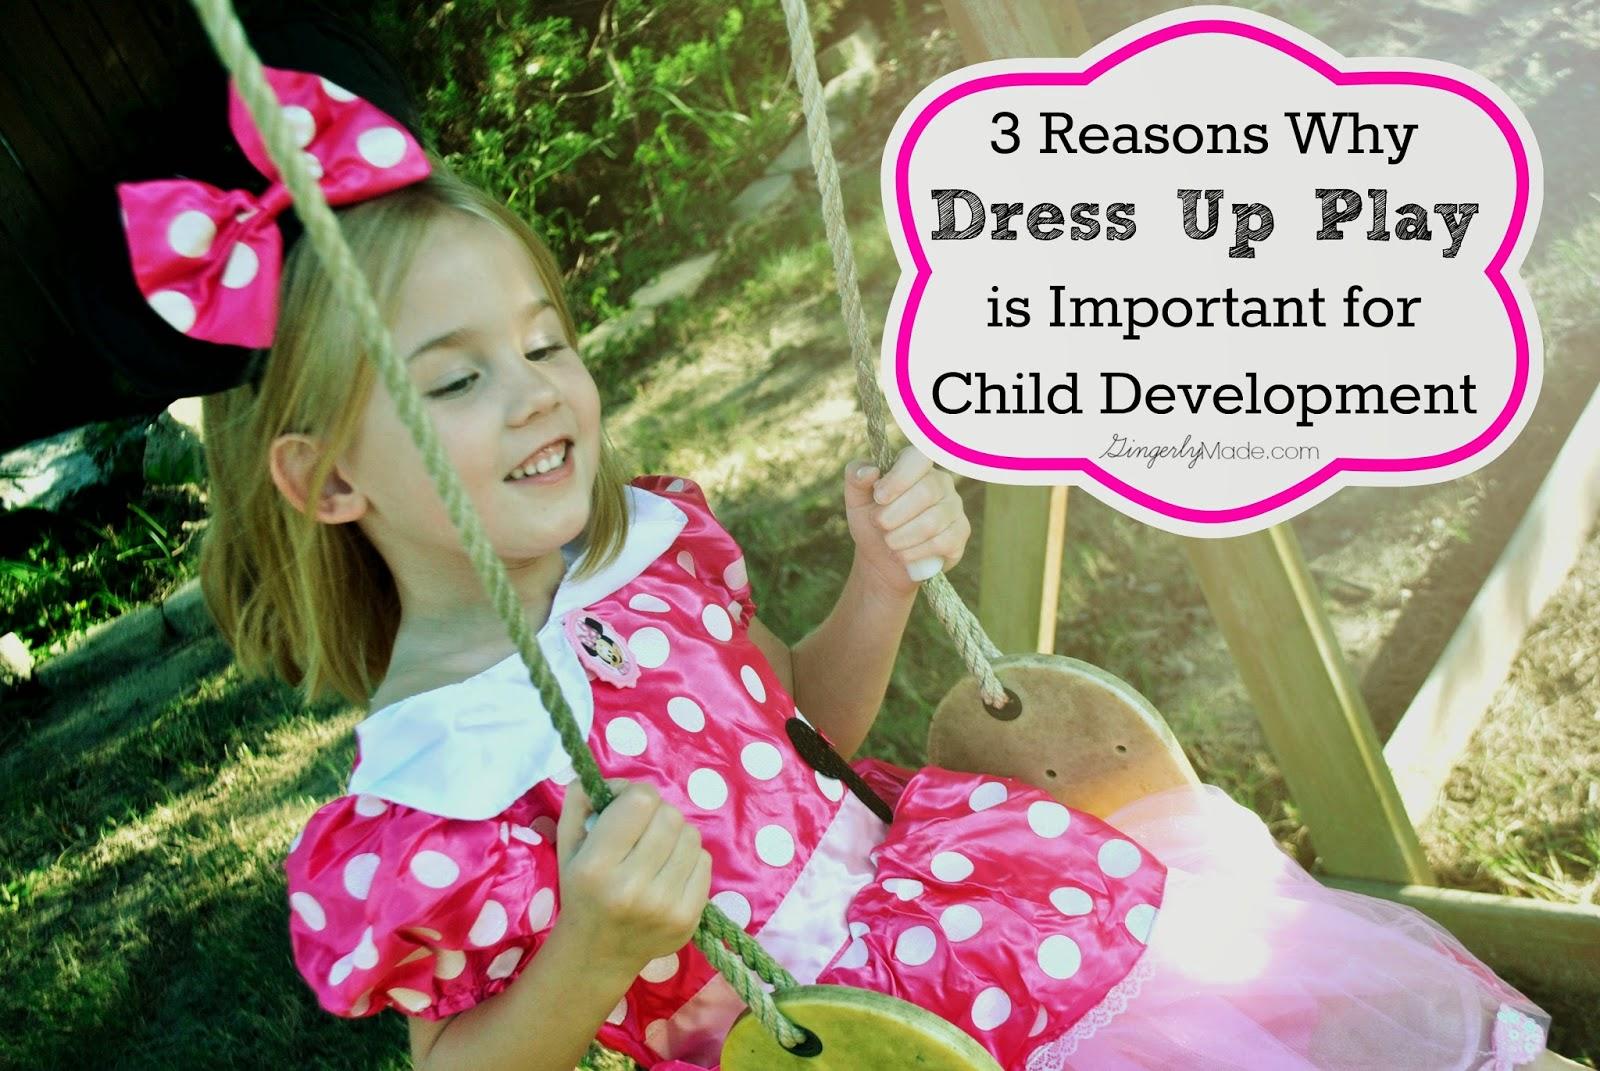 Dress Up Play Child Development